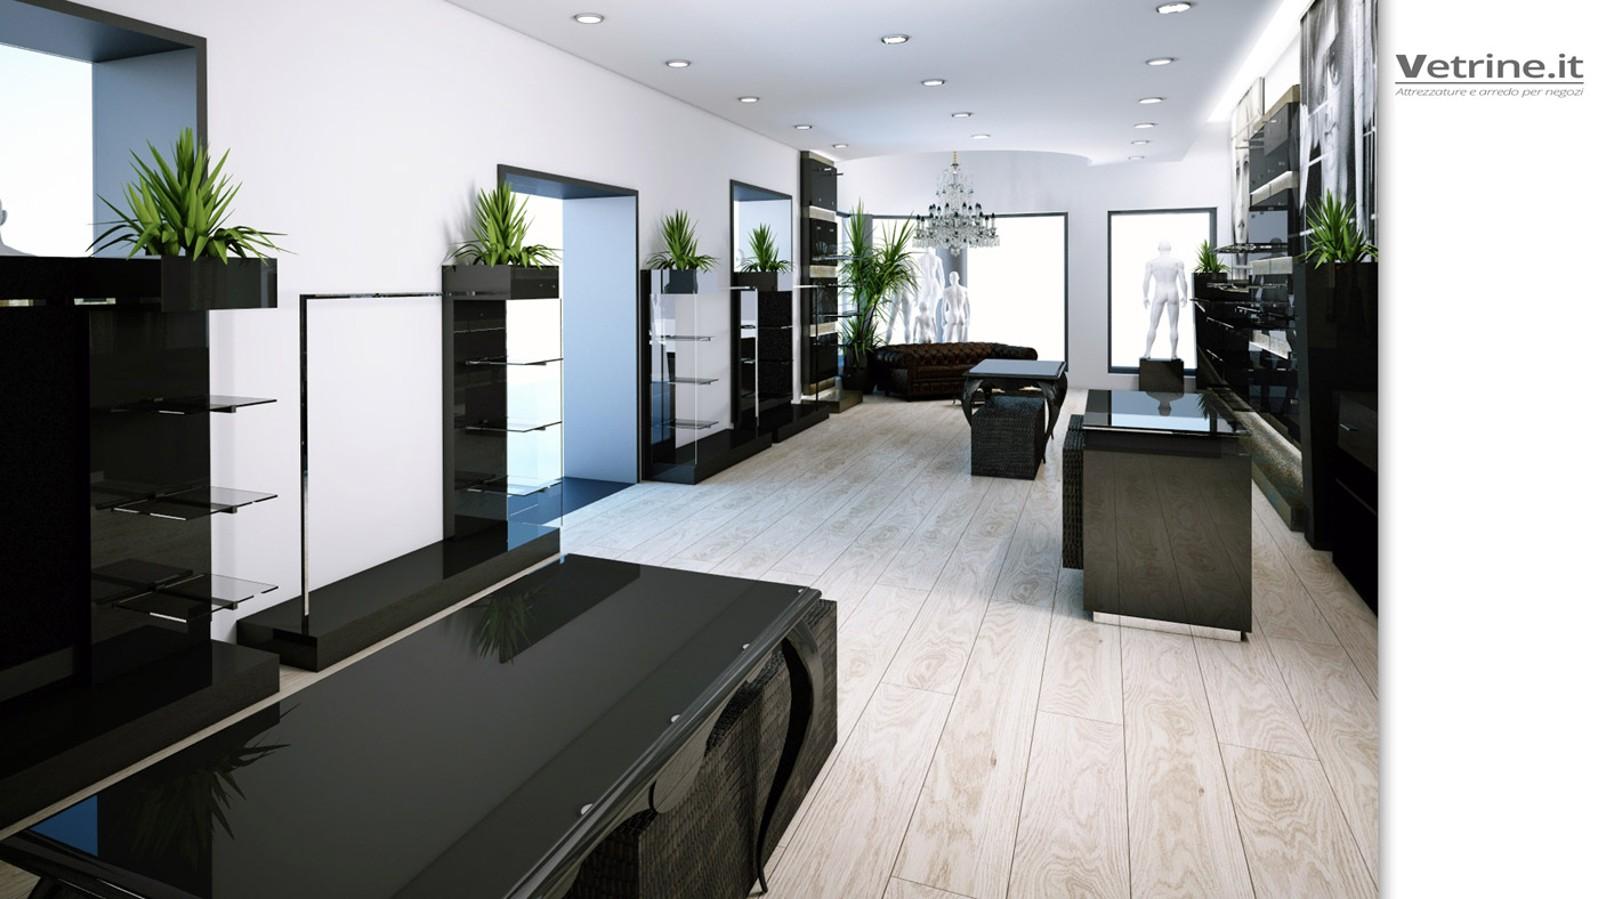 Arredamenti negozi roma arredamenti per negozi a modena for Punti vendita di mobili di design